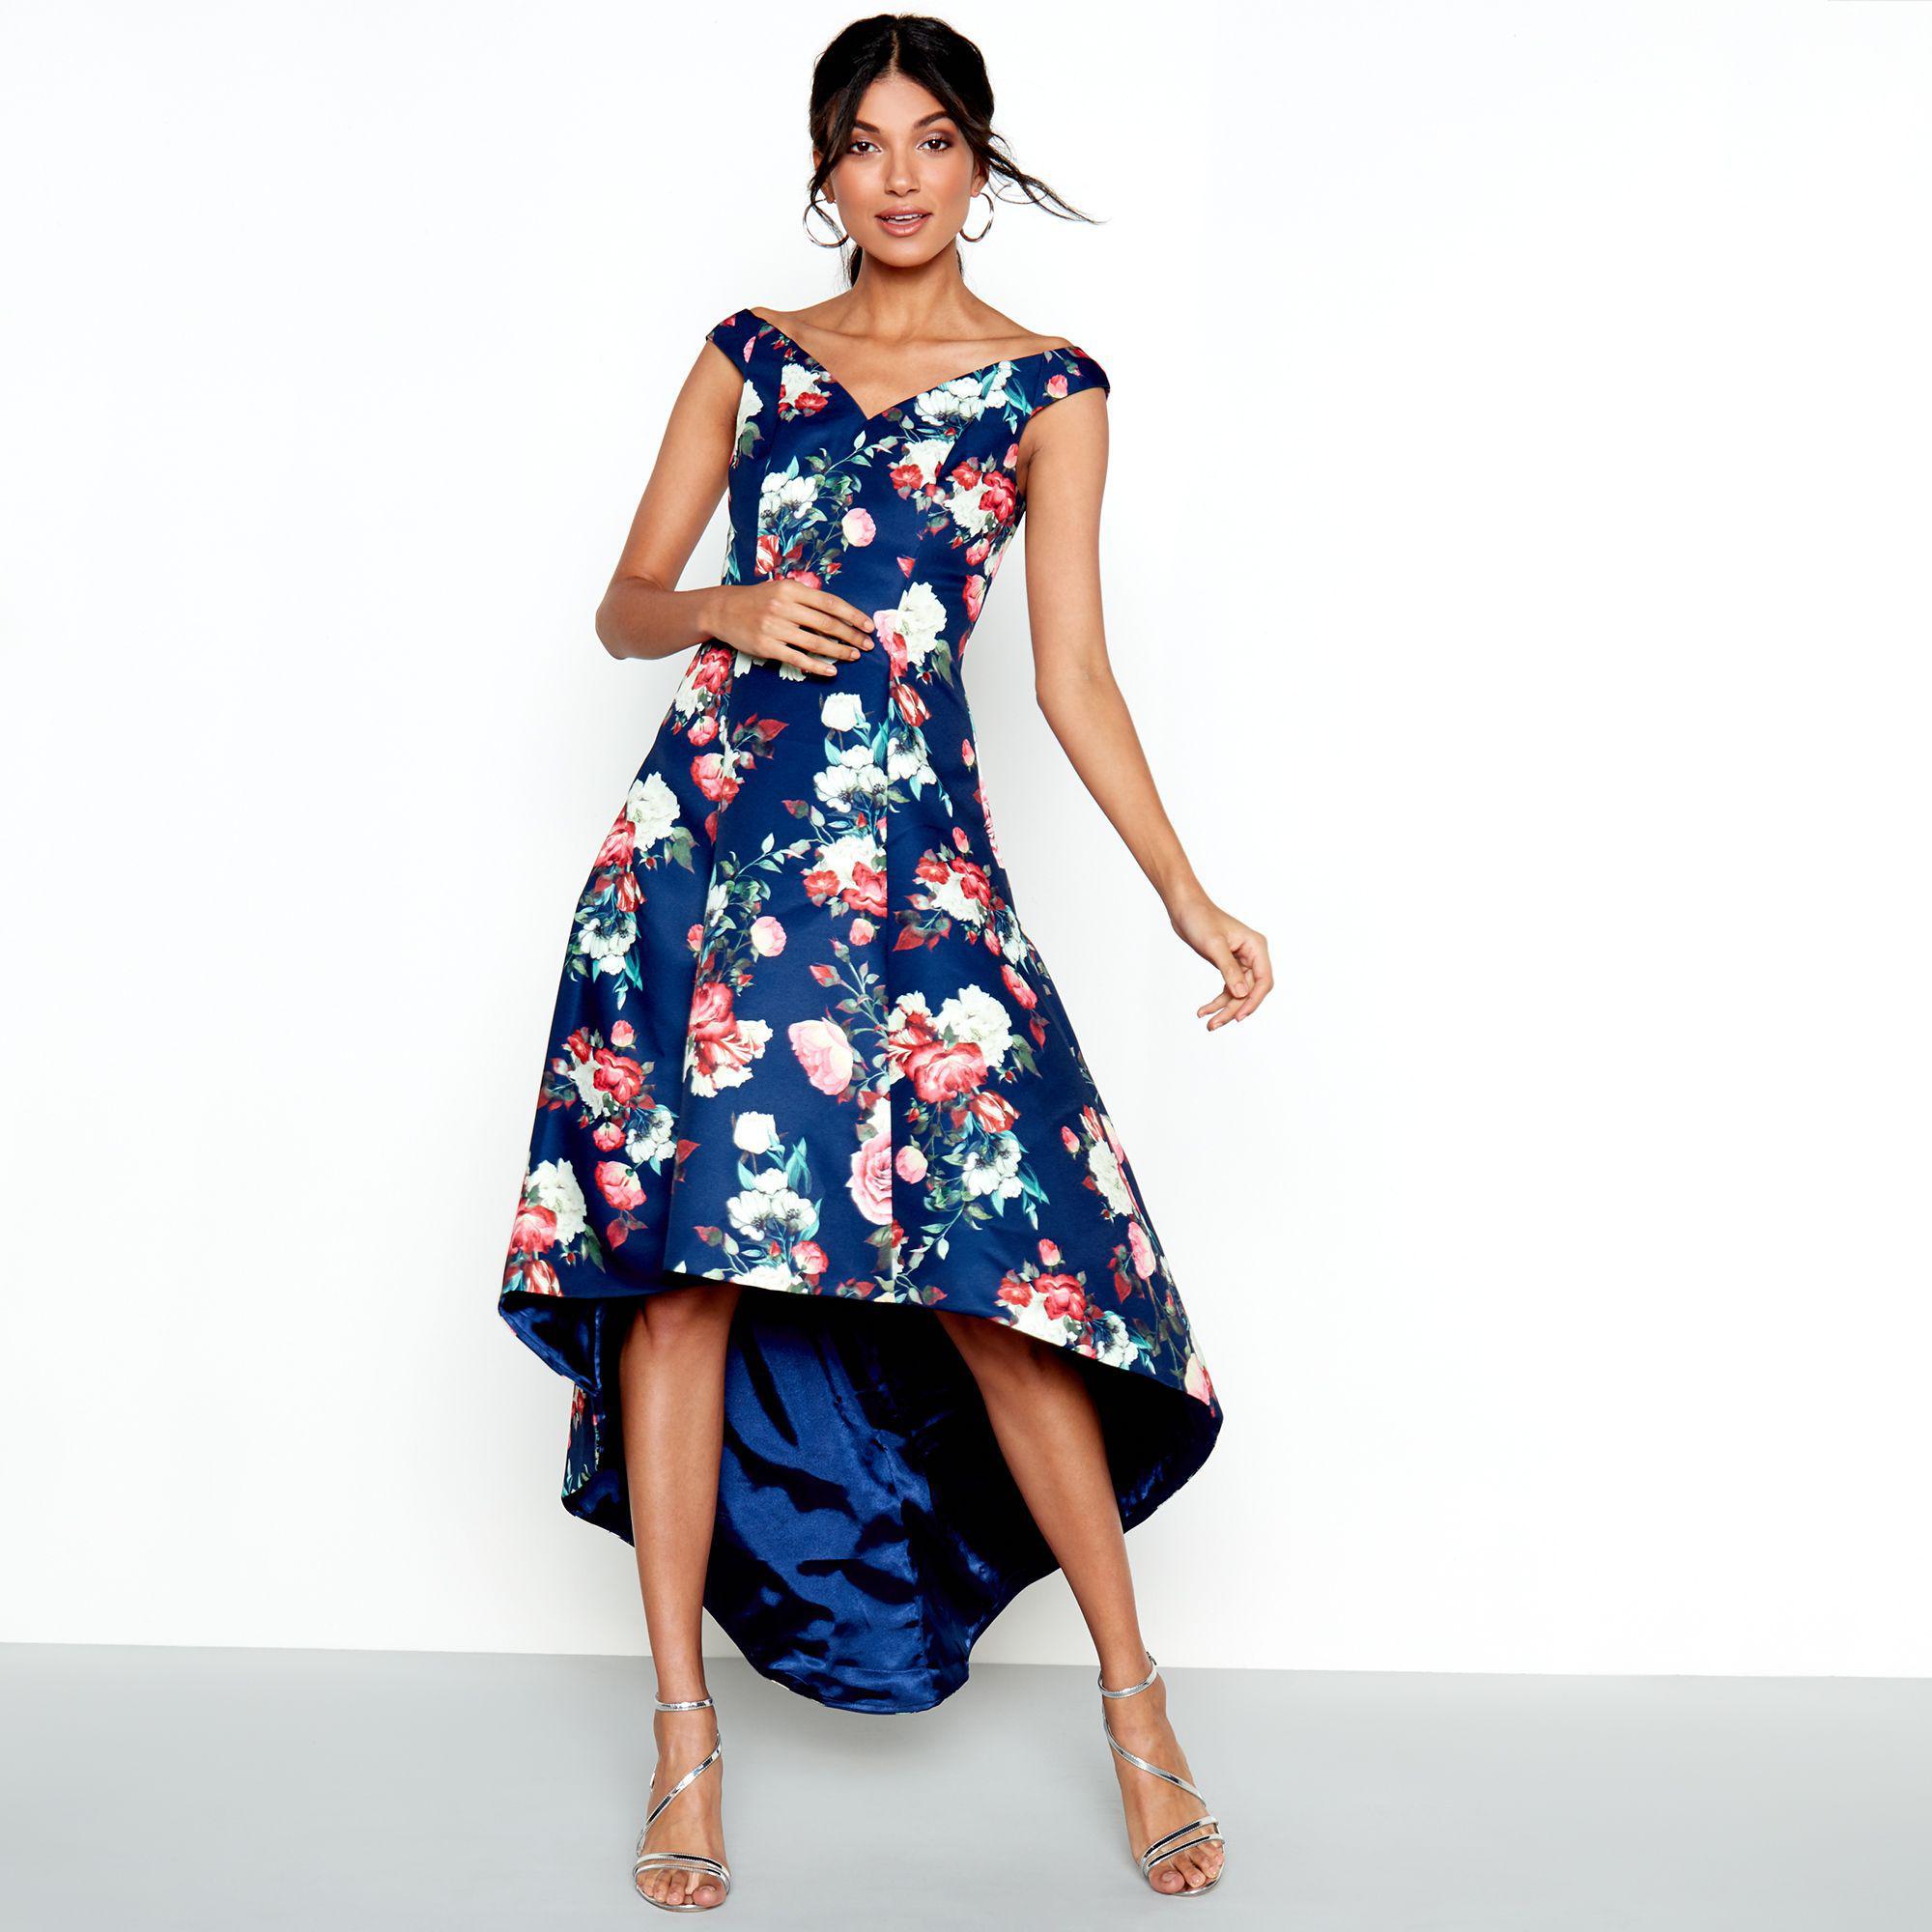 cccfc562e8 Lipsy Navy Floral Print Satin 'zinnia' Bardot High Low Dress in Blue ...